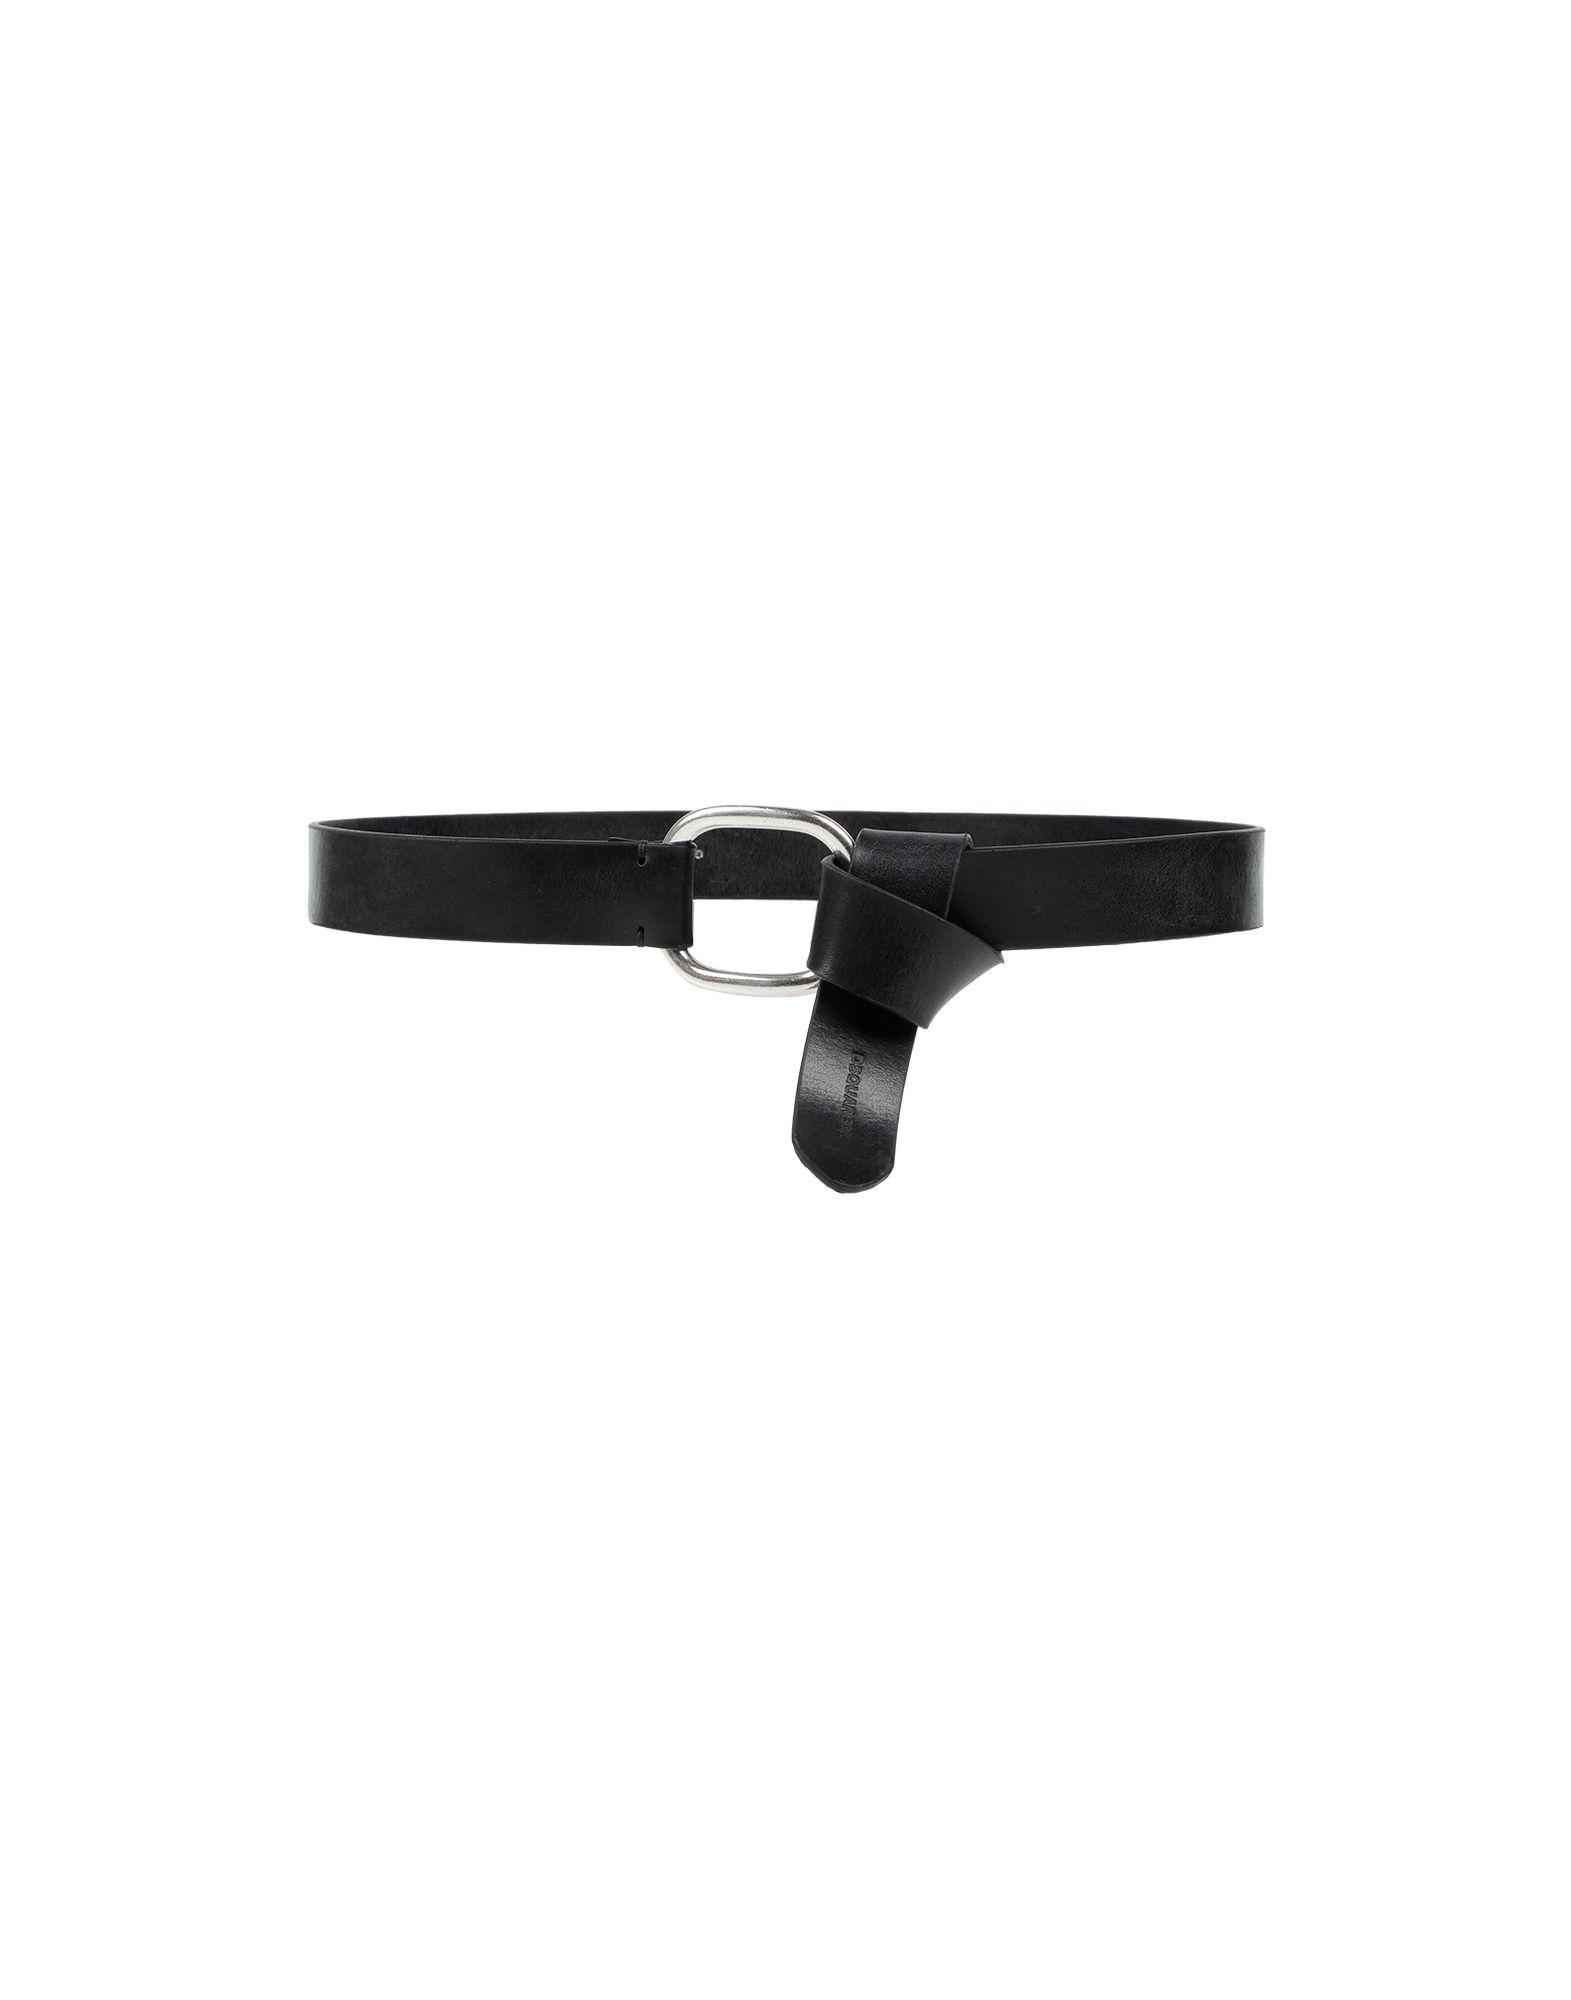 DSQUARED2 Belts - Item 46628505